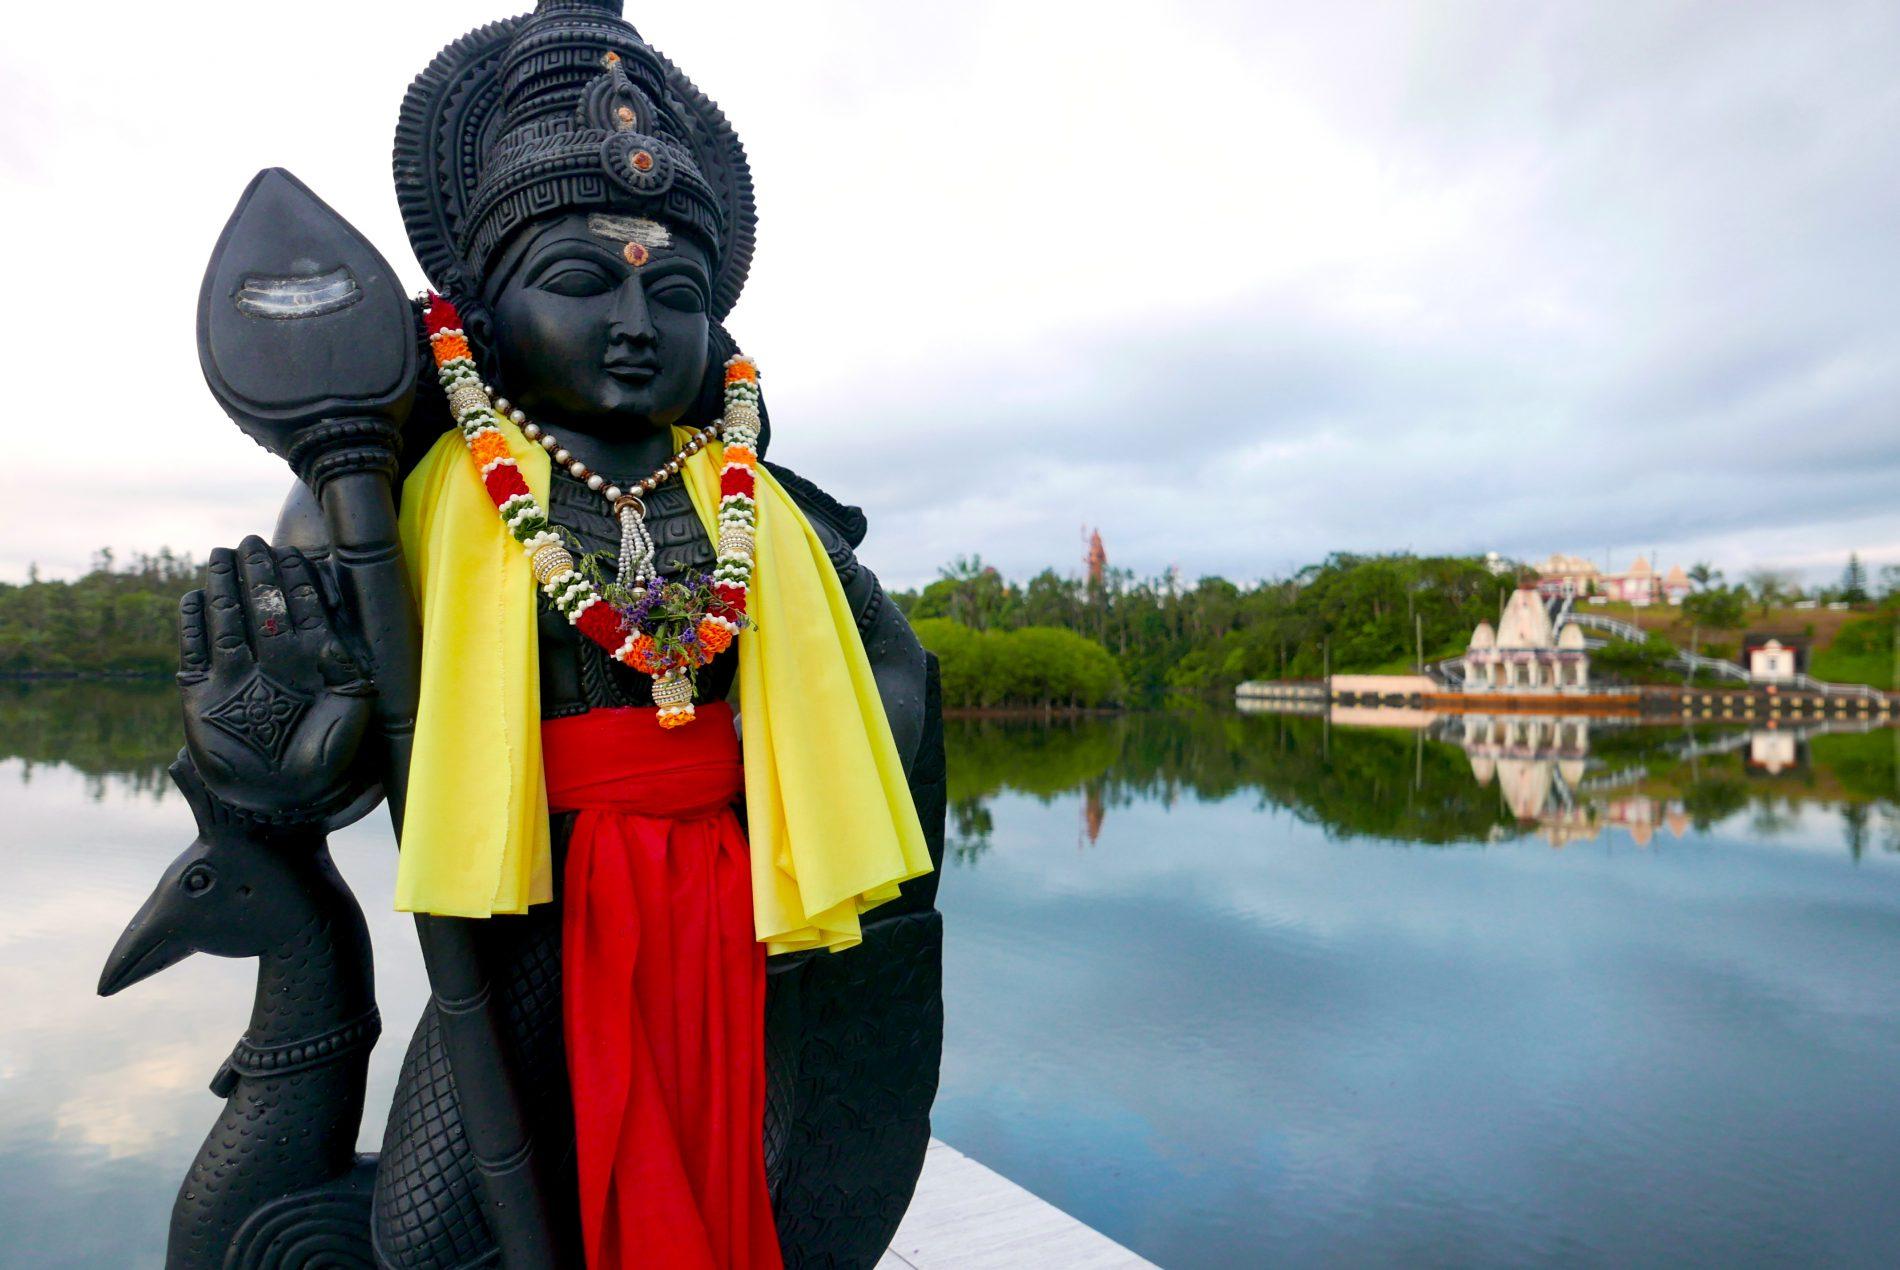 Imagens dos deuses hindus em Grand Bassin, Mauritius (Fotos: Claudia Tonaco)